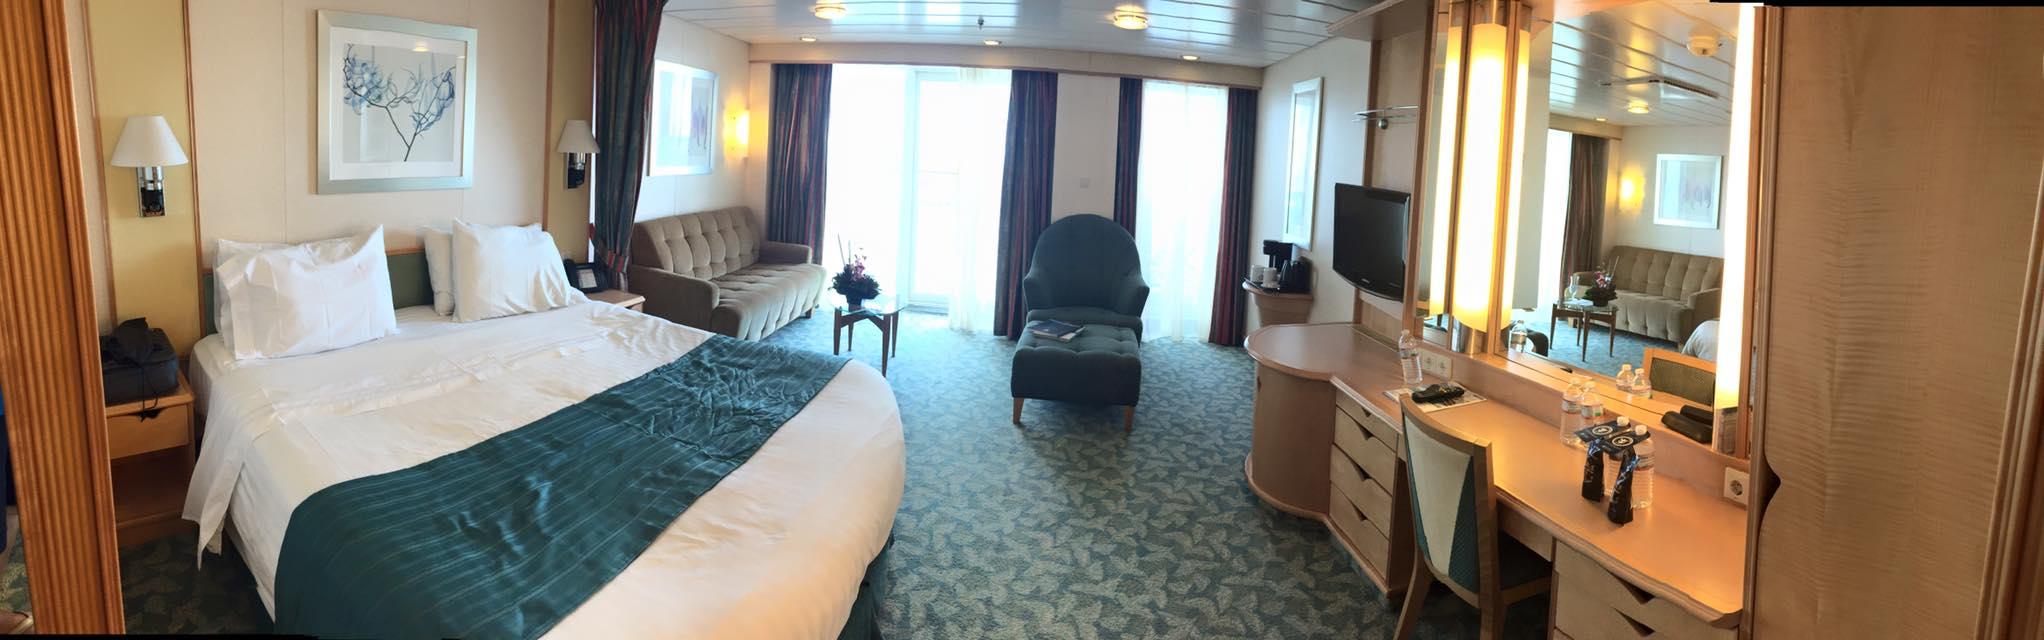 Images Independence Seas Jr Suite